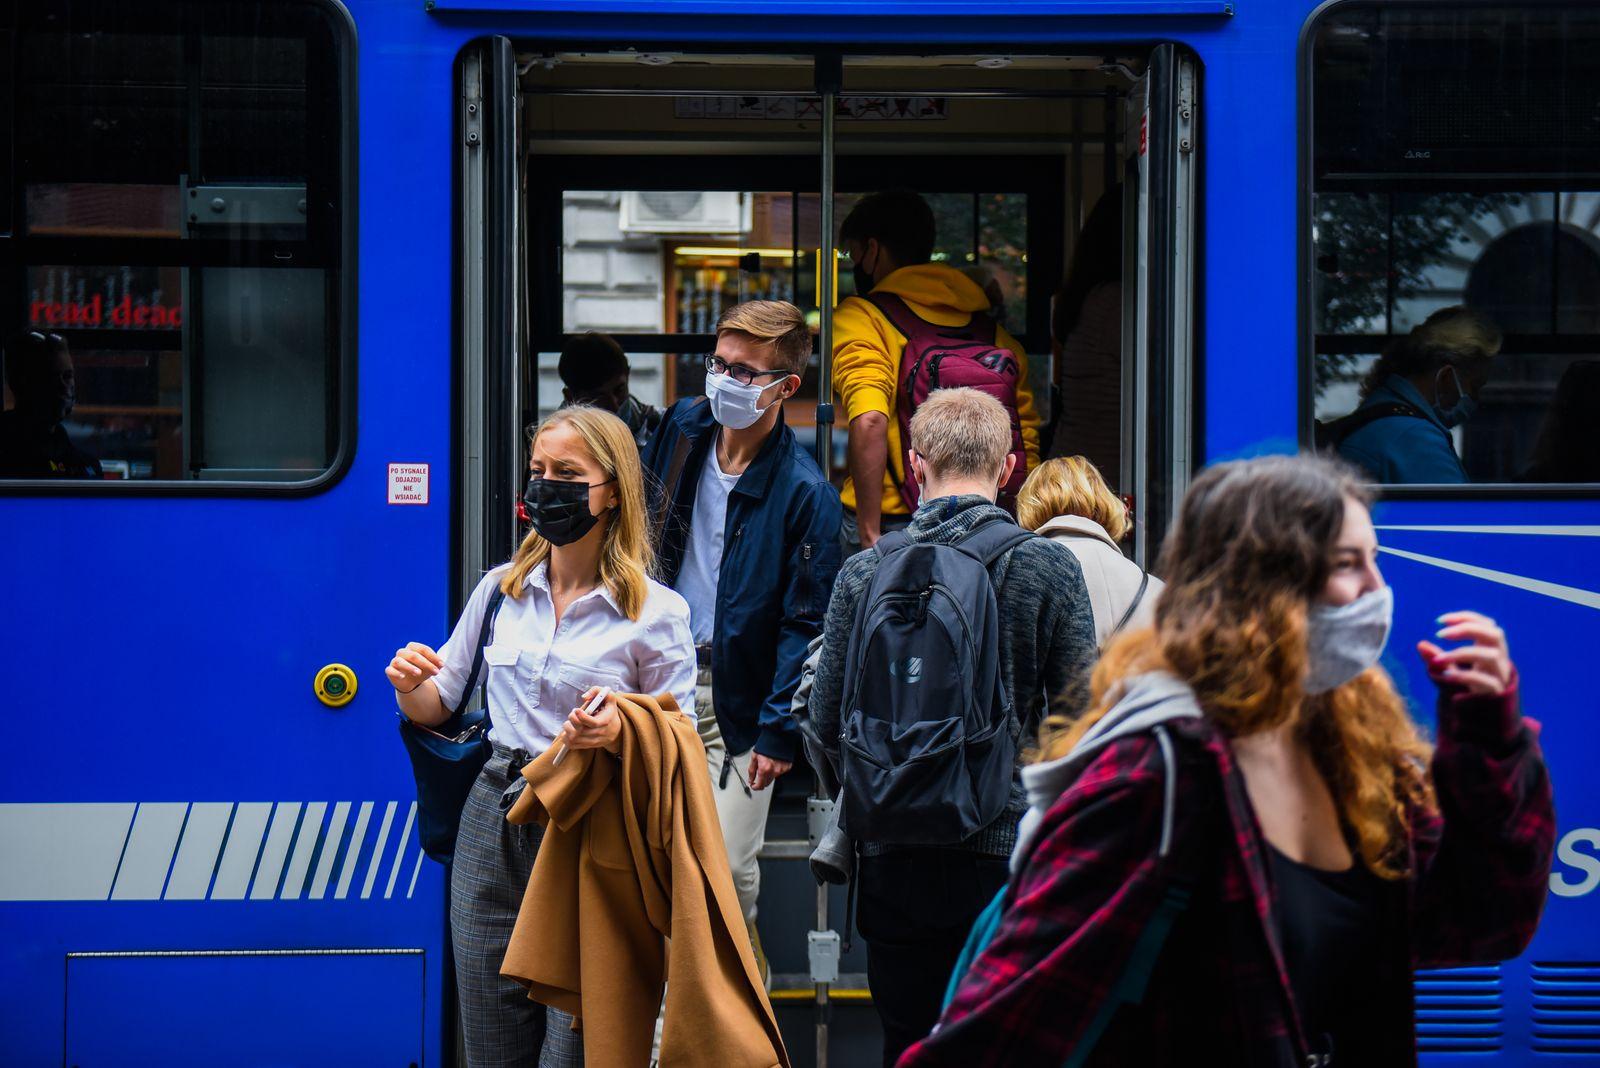 Poland Daily Life Amid Coronavirus Pandemic